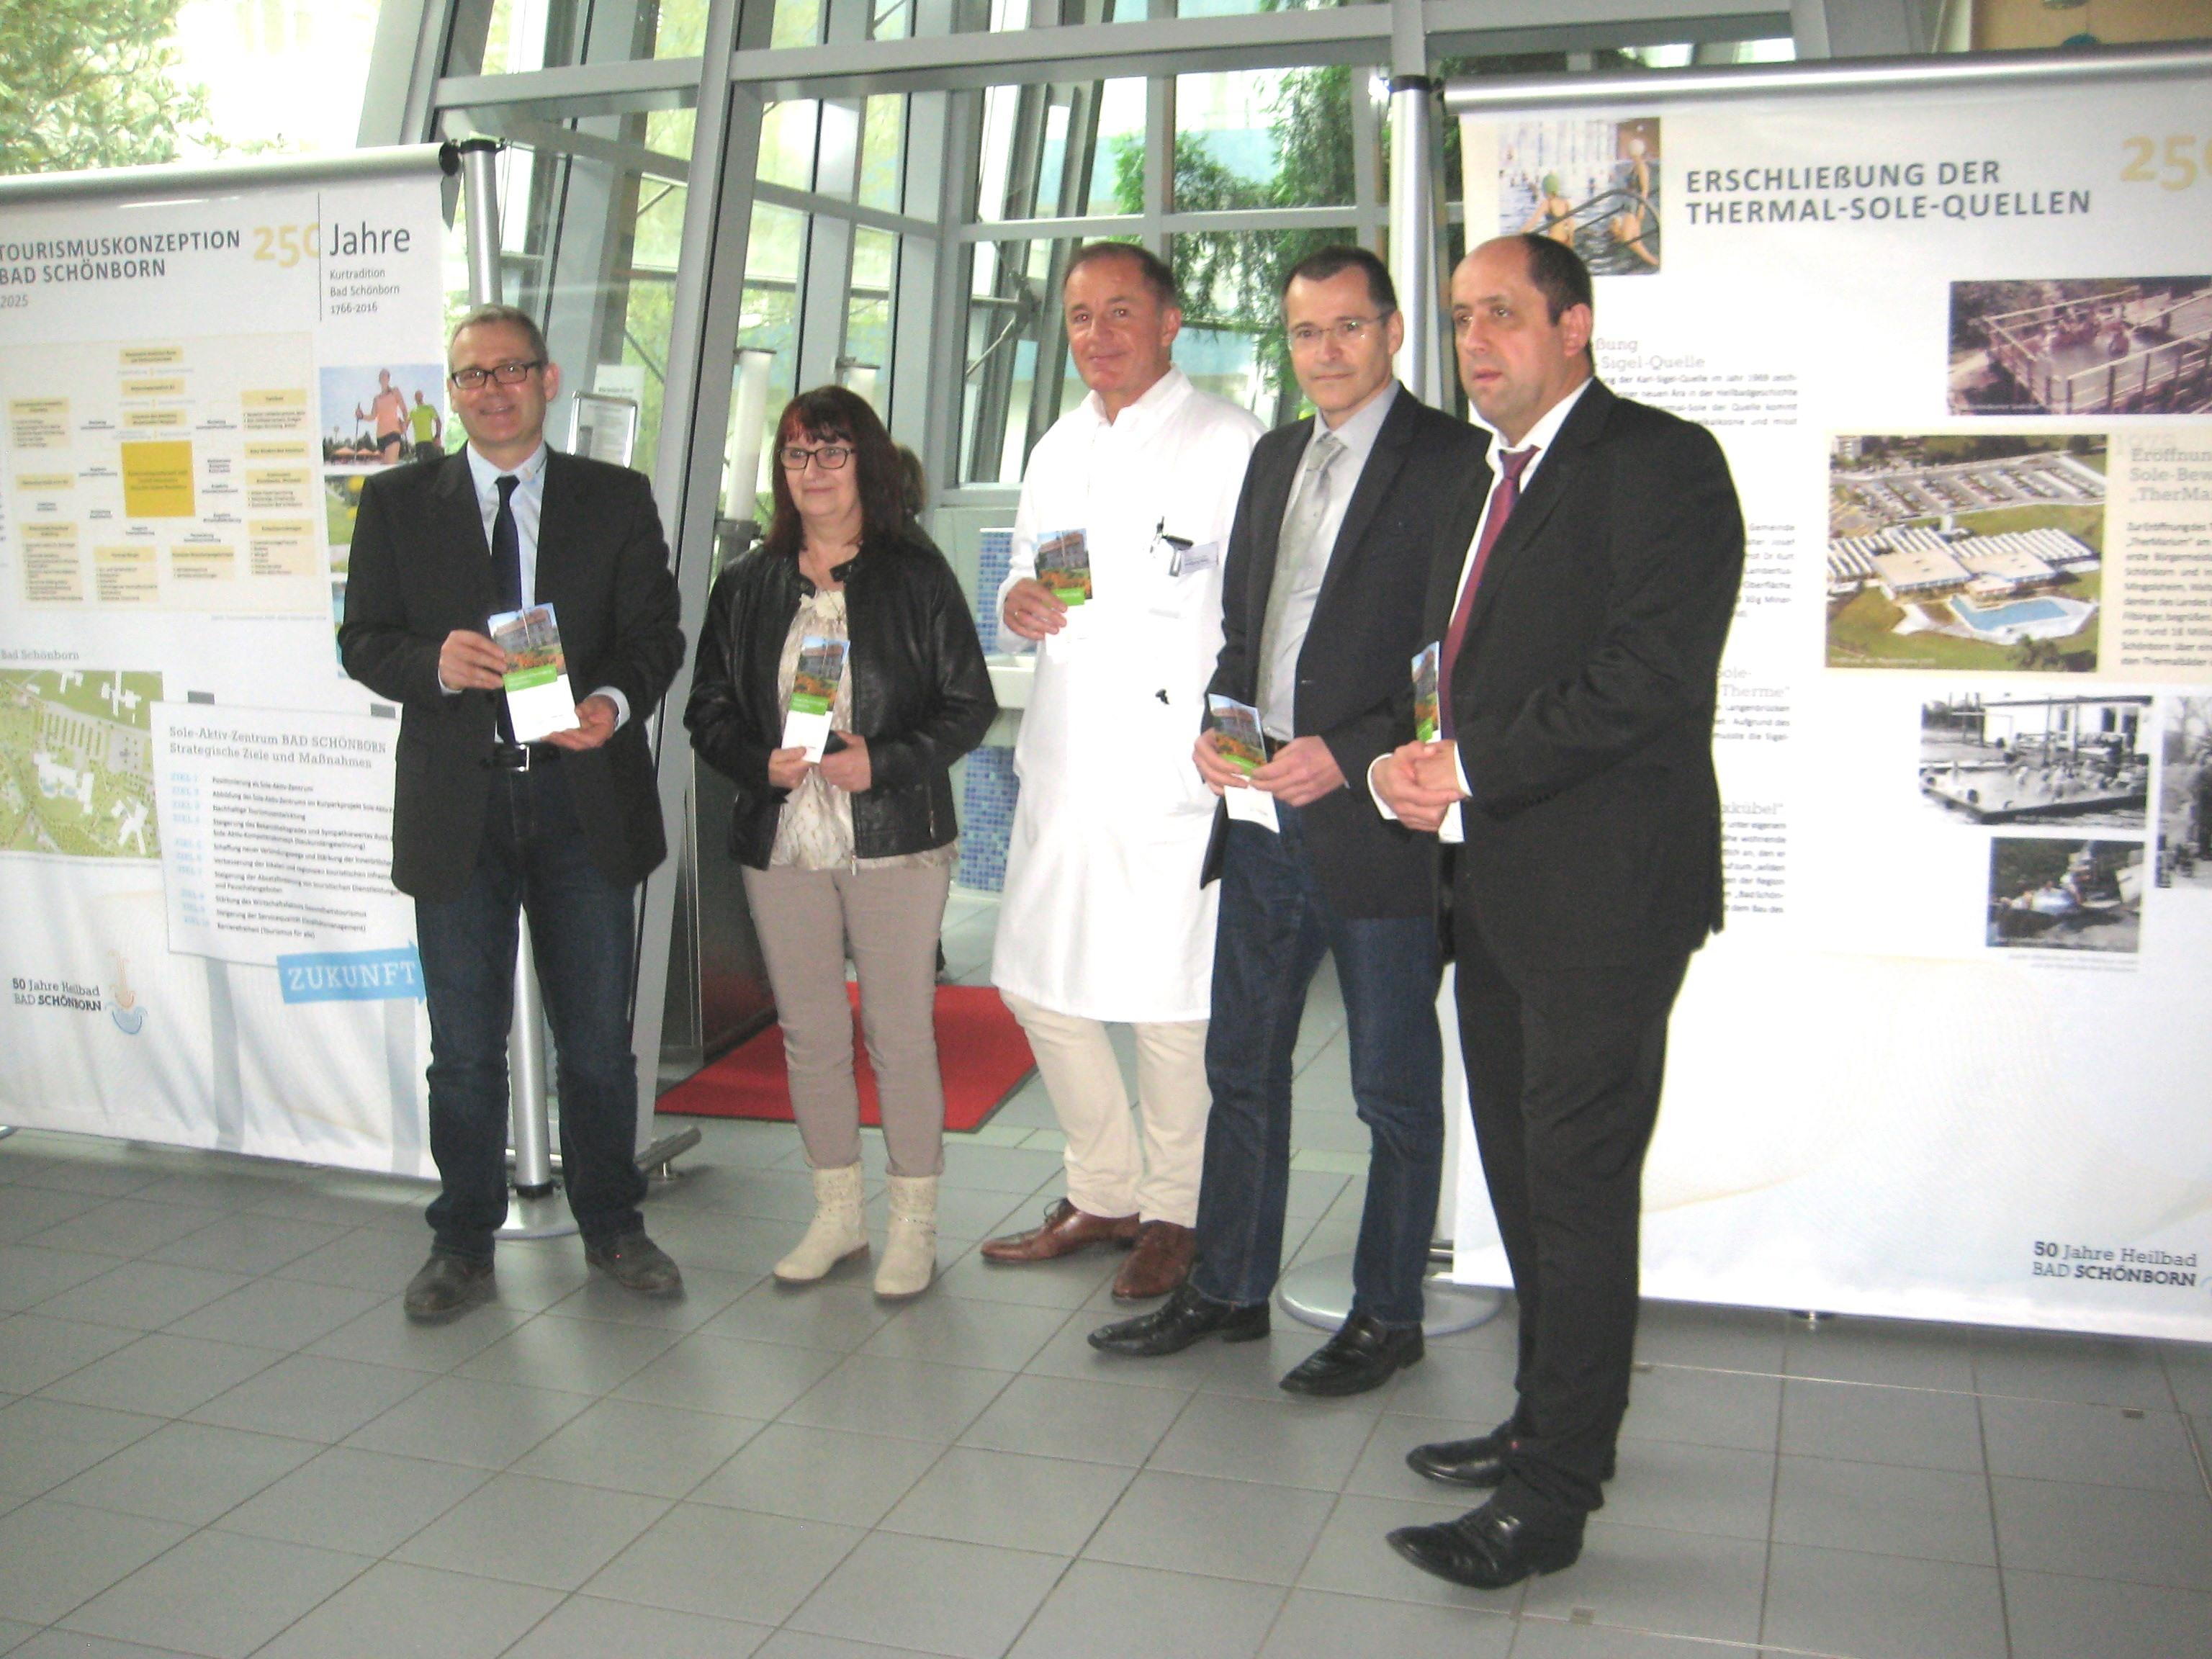 Eröffnung Ausstellung